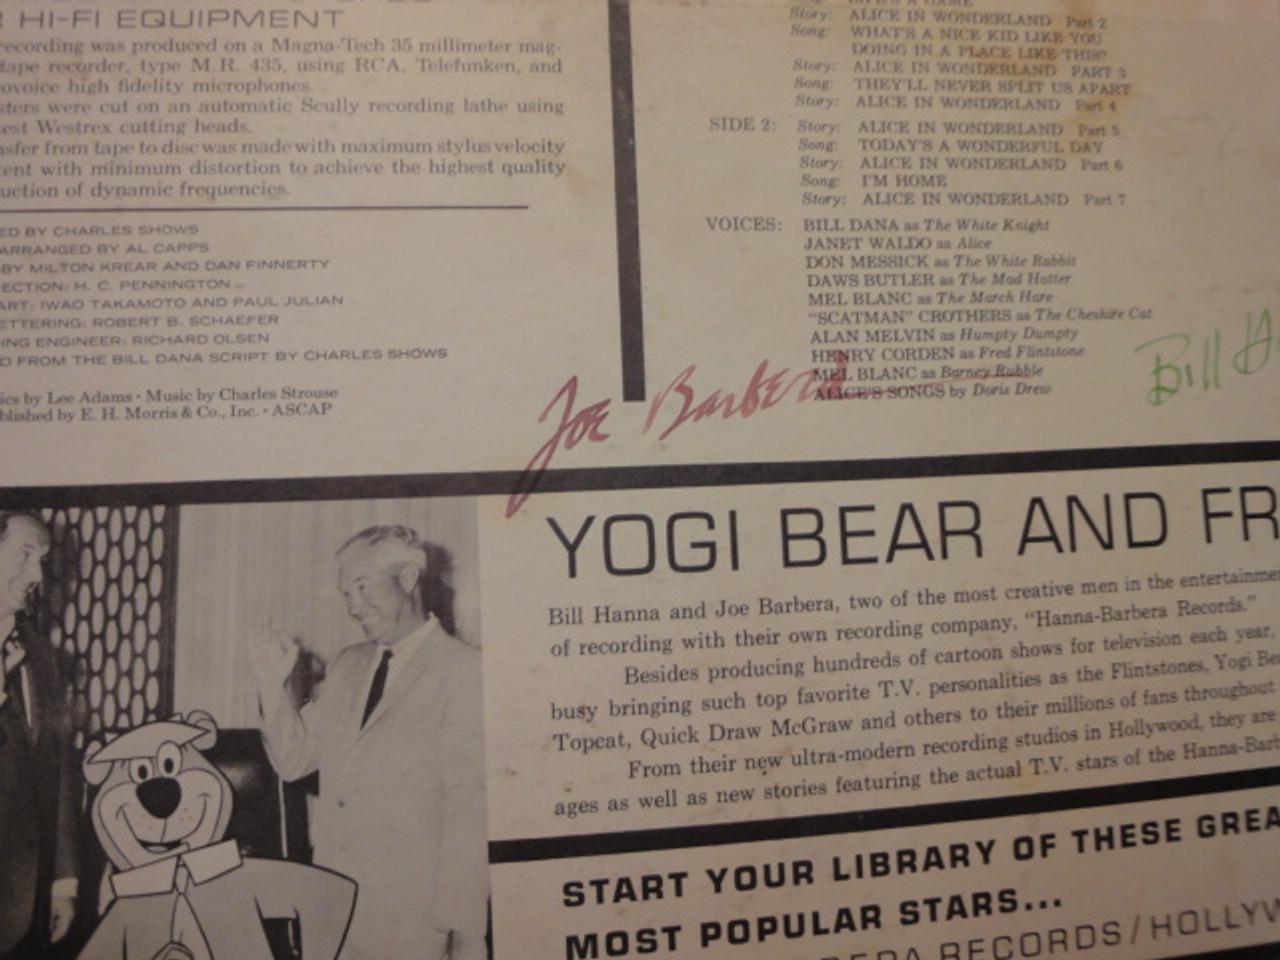 The New Alice In Wonderland Bill Hanna Joe Barbera 1966 LP Signed Autograph